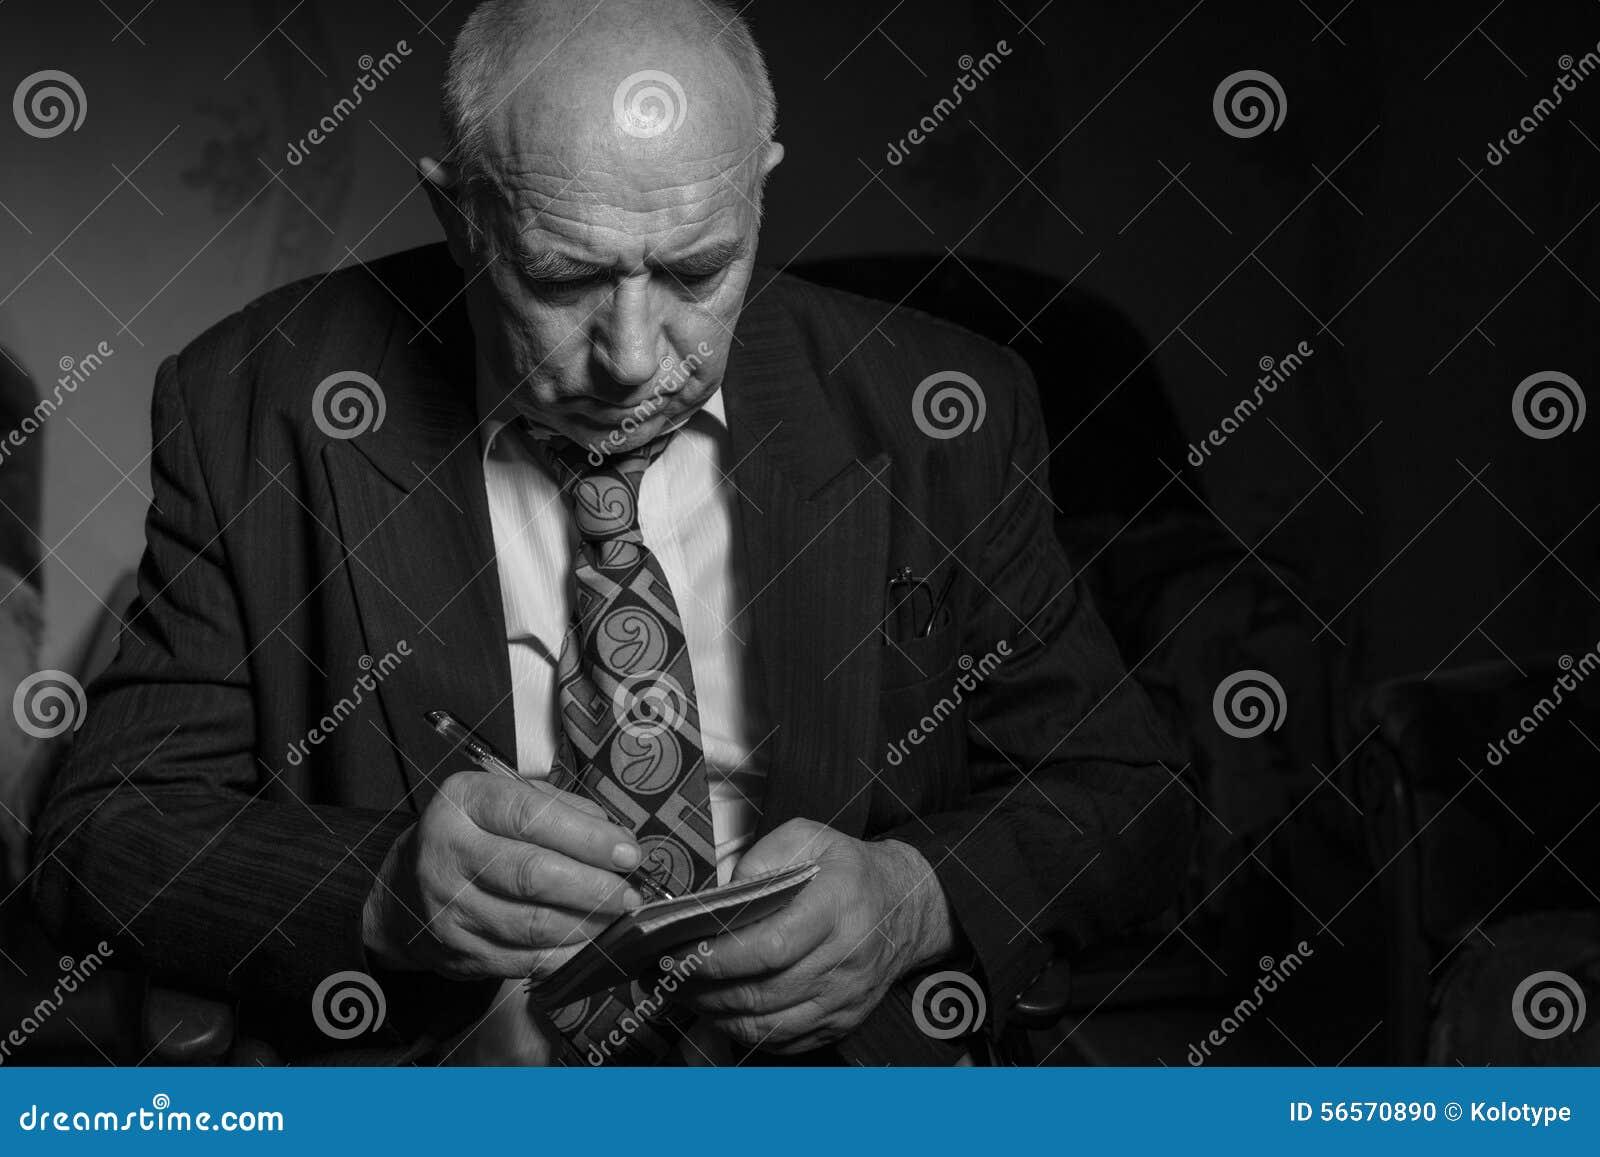 Download Παλαιός επιχειρηματίας που γράφει μερικές σημειώσεις σε μονοχρωματικό Στοκ Εικόνες - εικόνα από πέννα, βλέμμα: 56570890